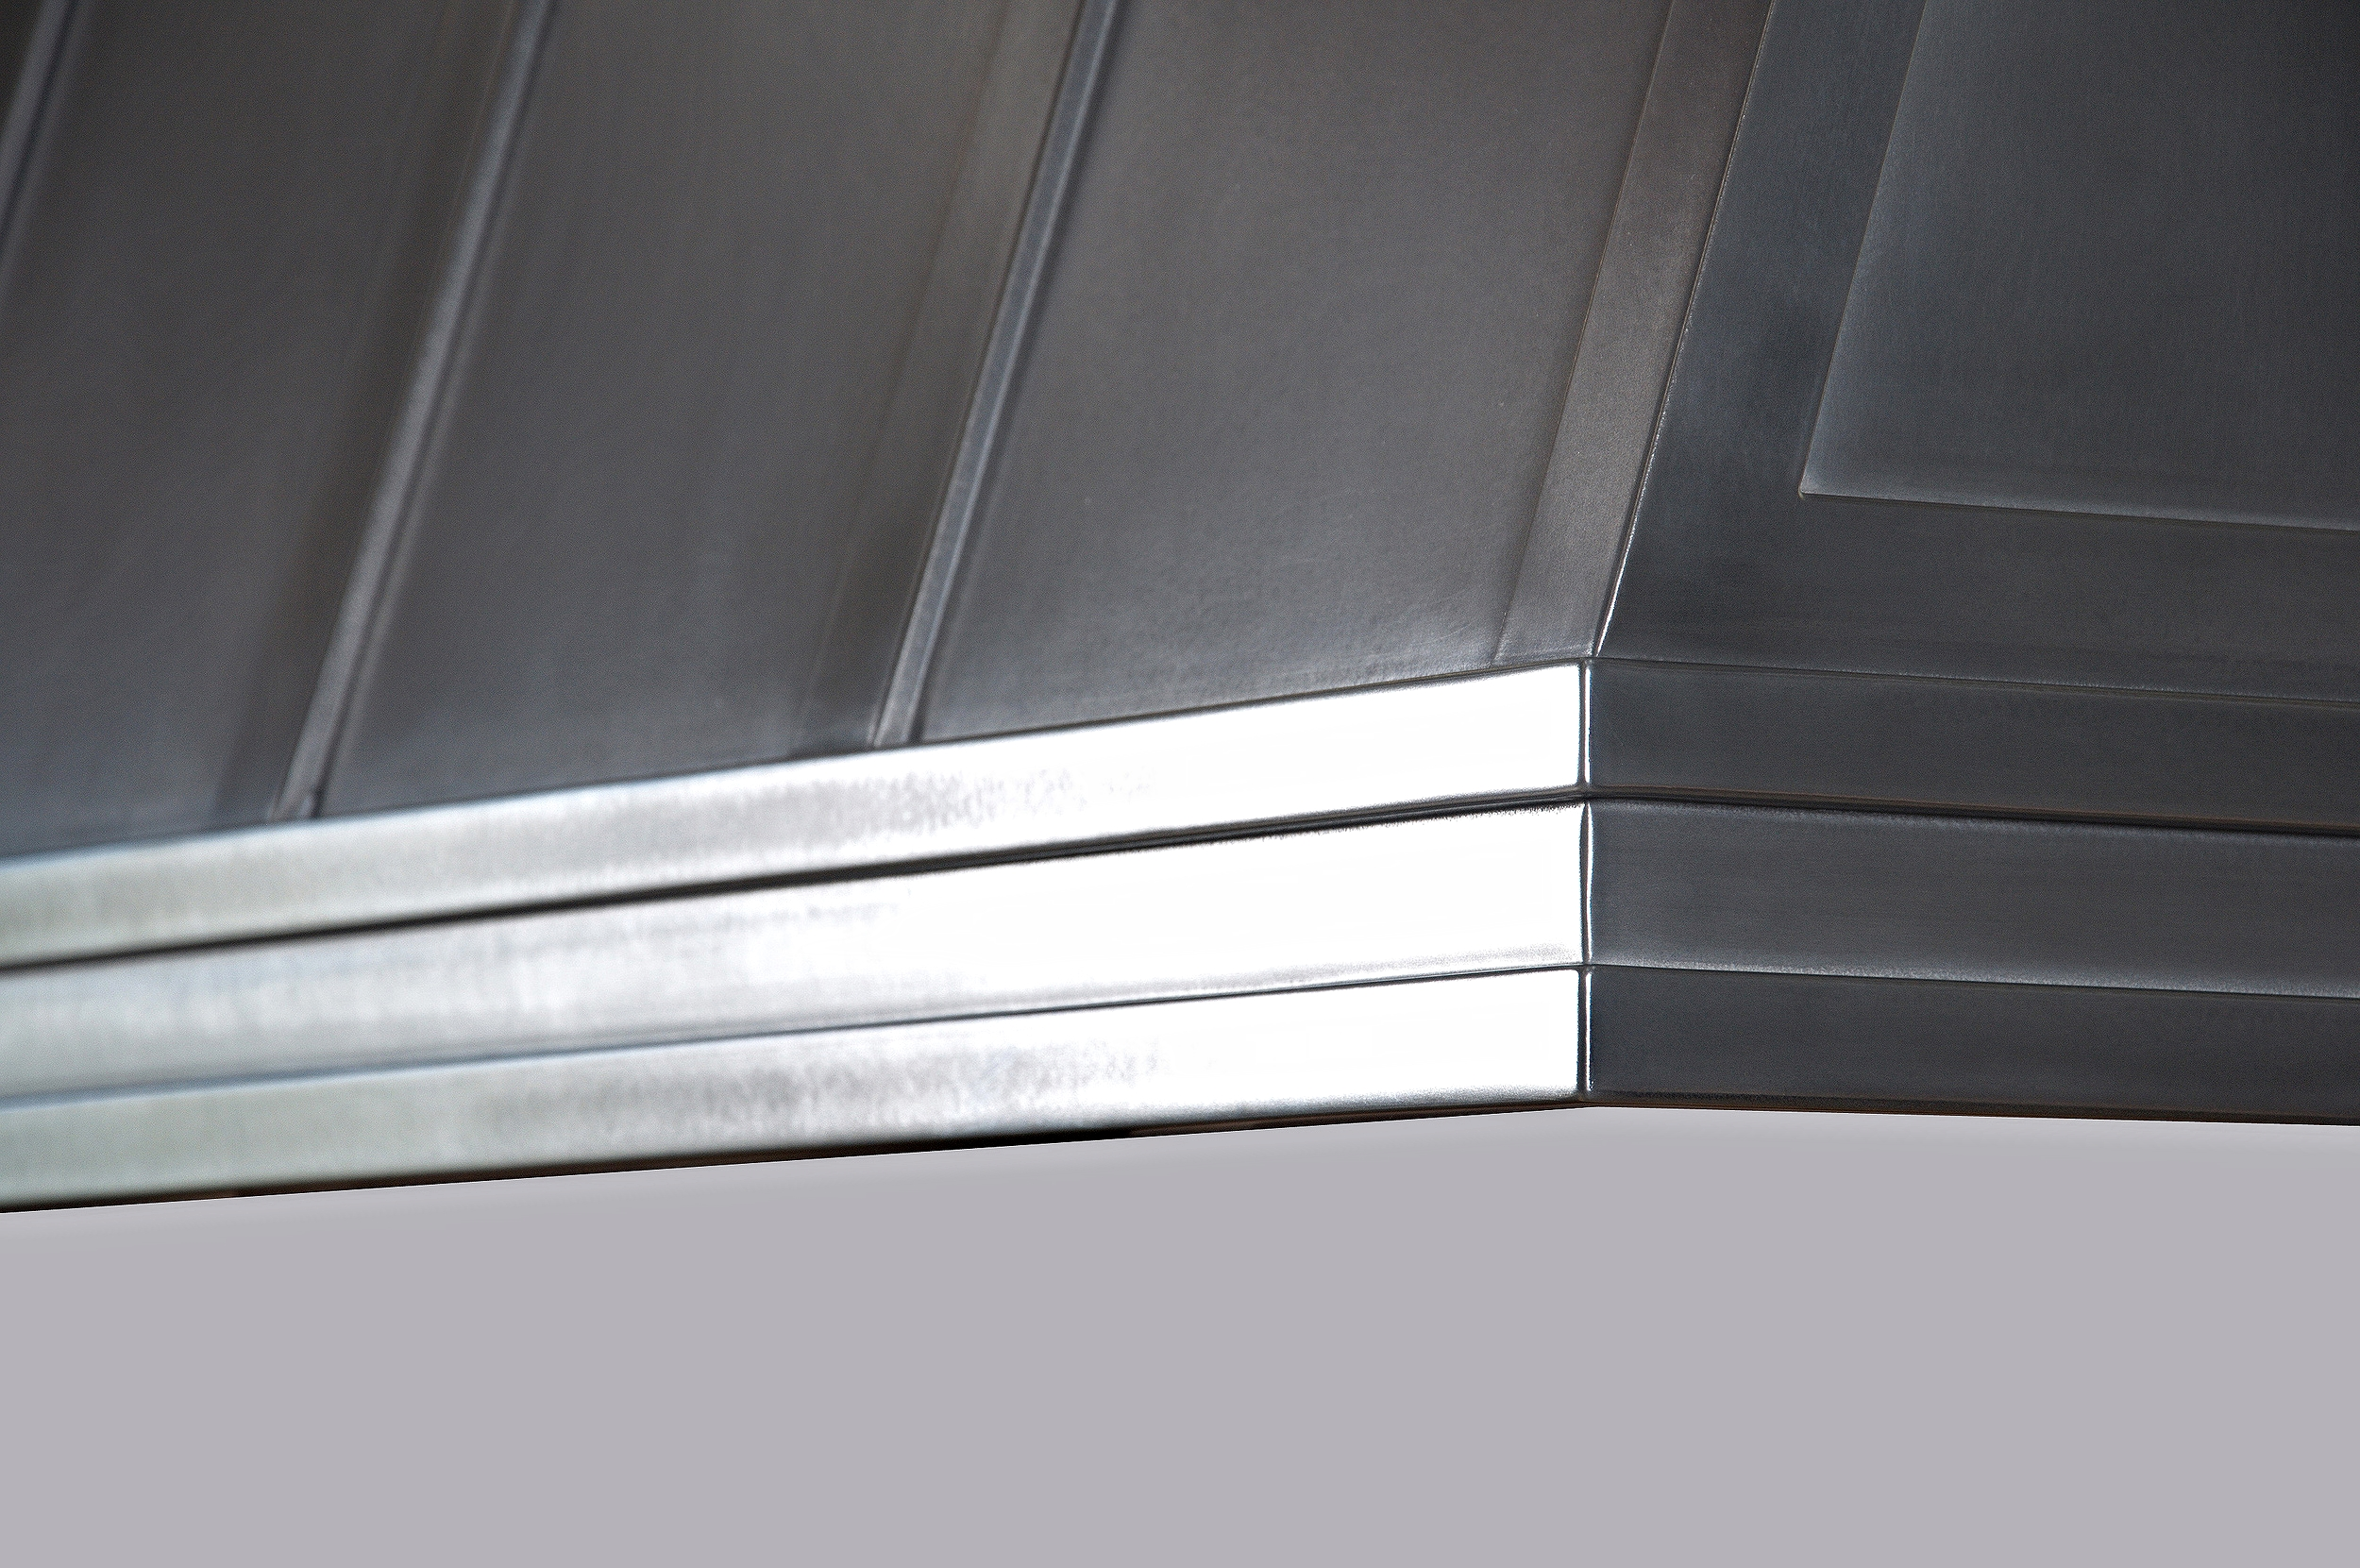 Metal Range Hood Shell Close-Up